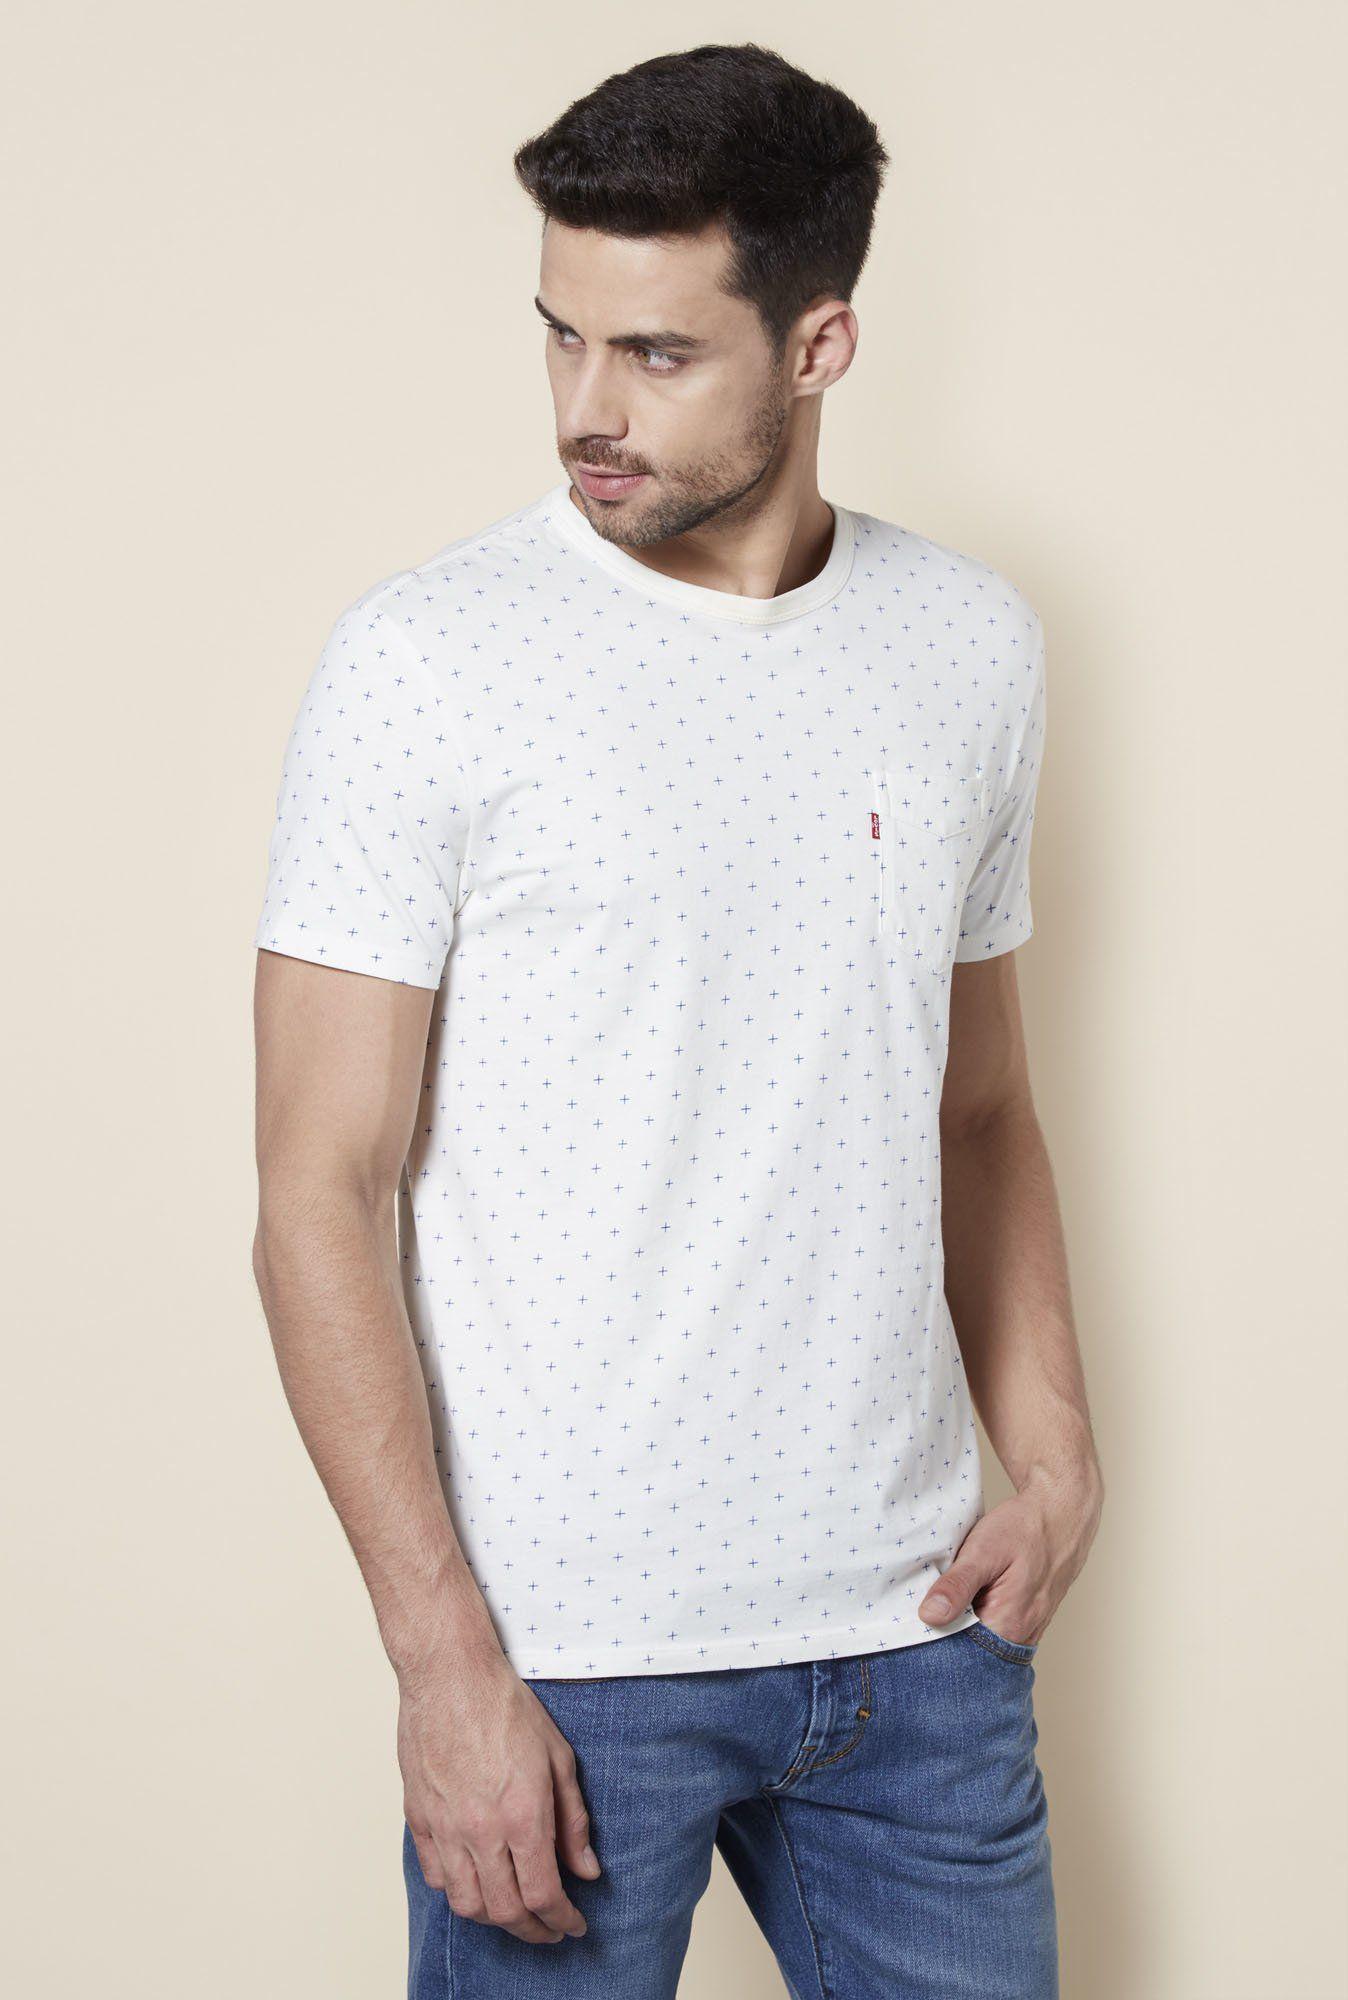 Levi's White Round T-Shirt